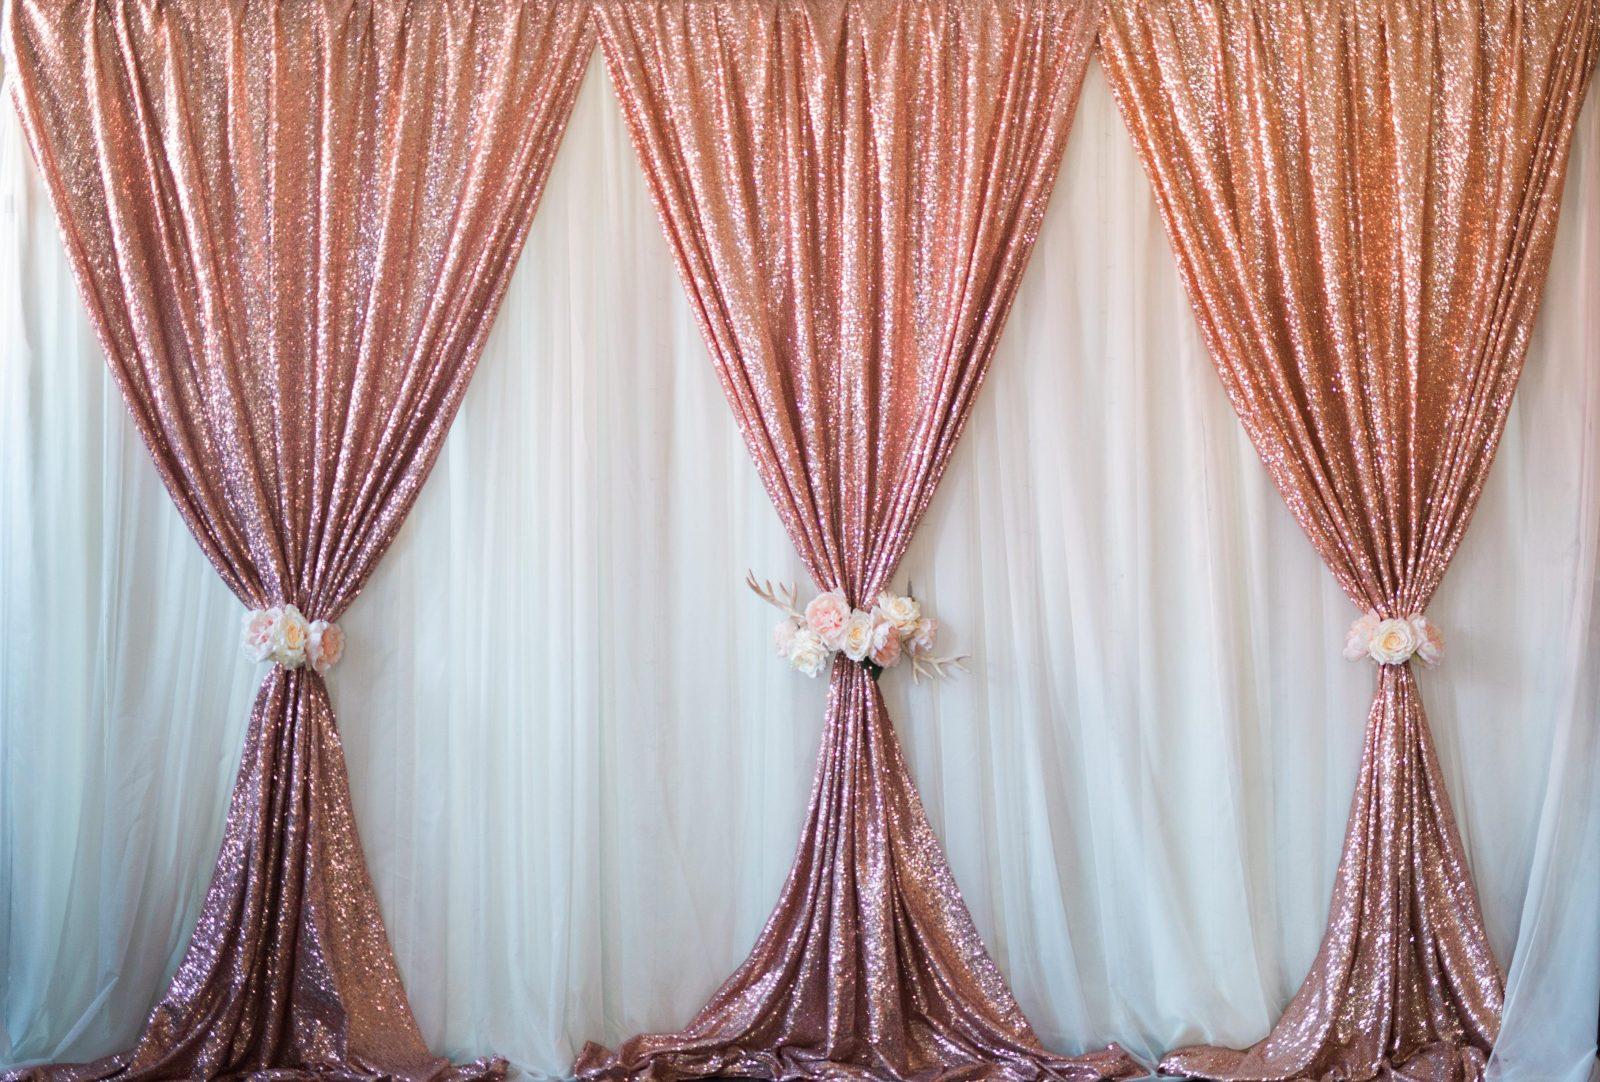 The backdrop draping